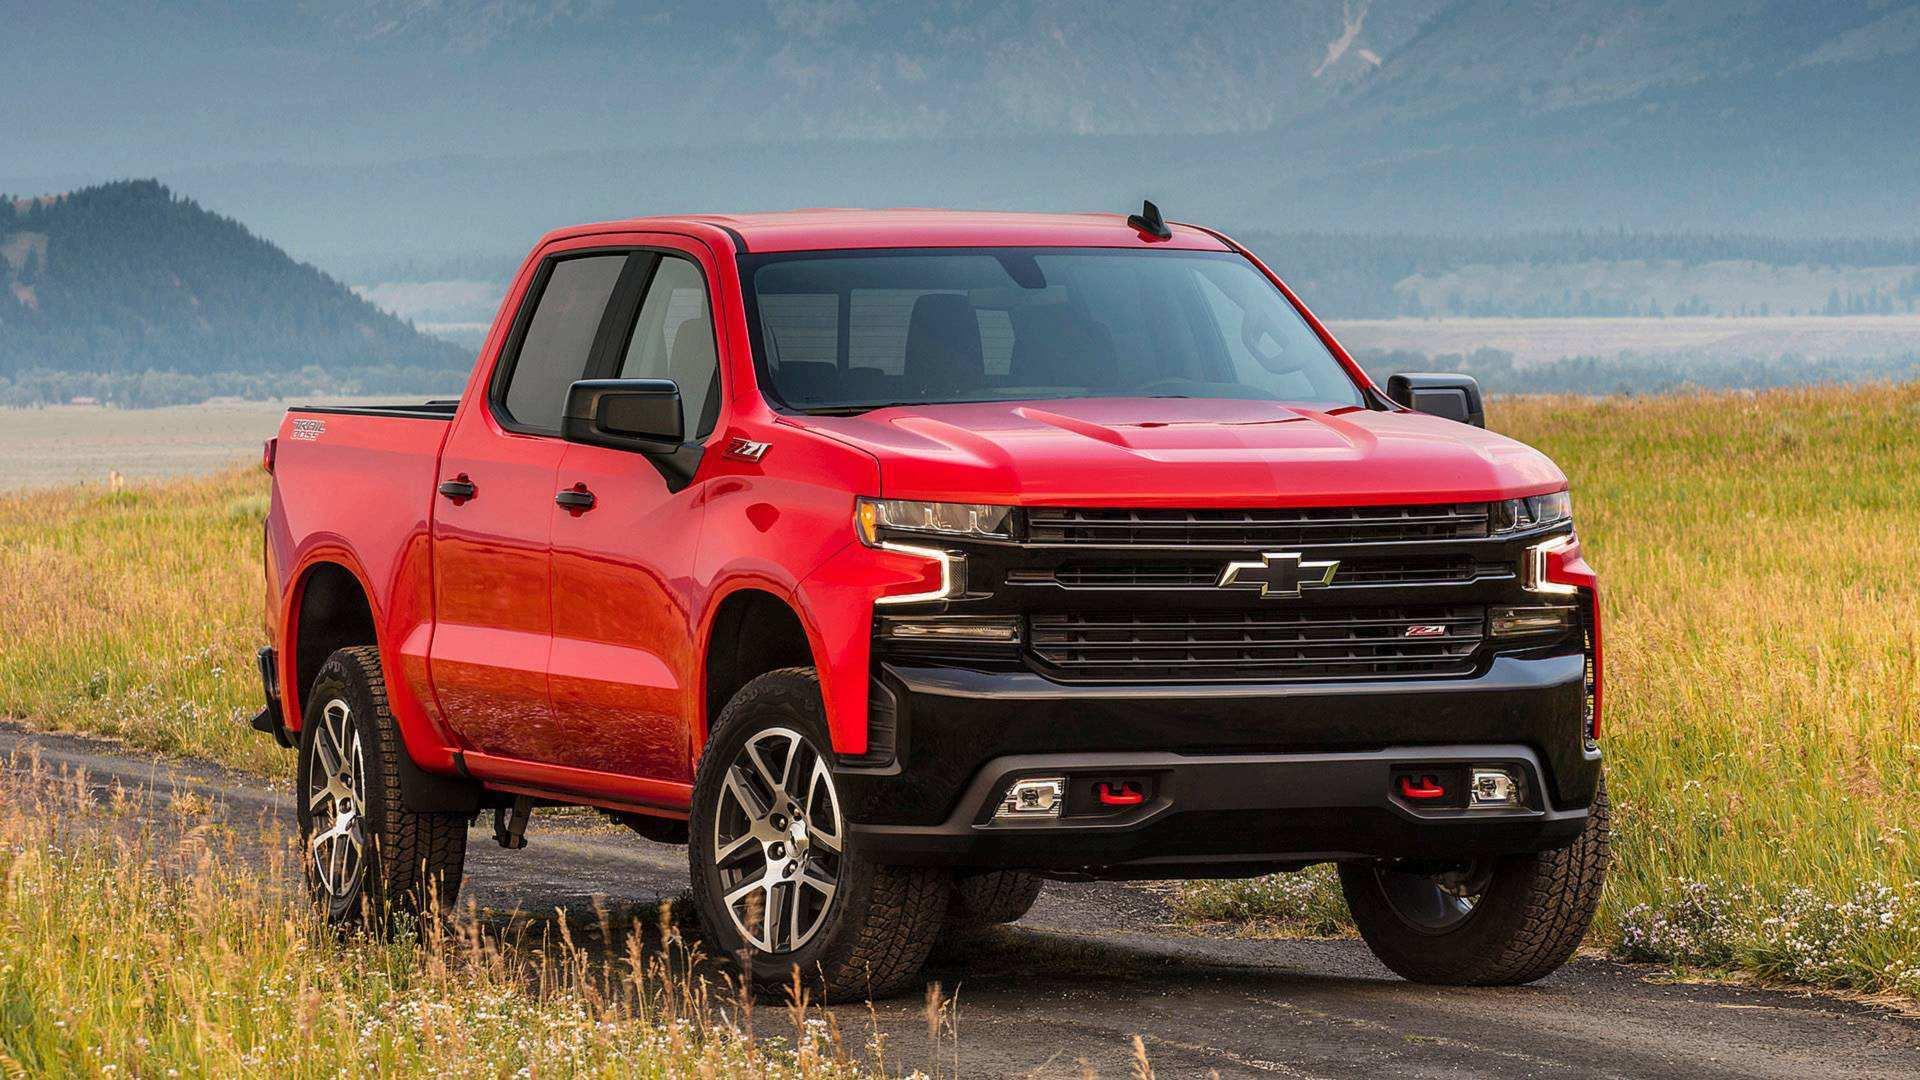 50 Gallery of New 2019 Chevrolet Silverado Aluminum First Drive Speed Test for New 2019 Chevrolet Silverado Aluminum First Drive